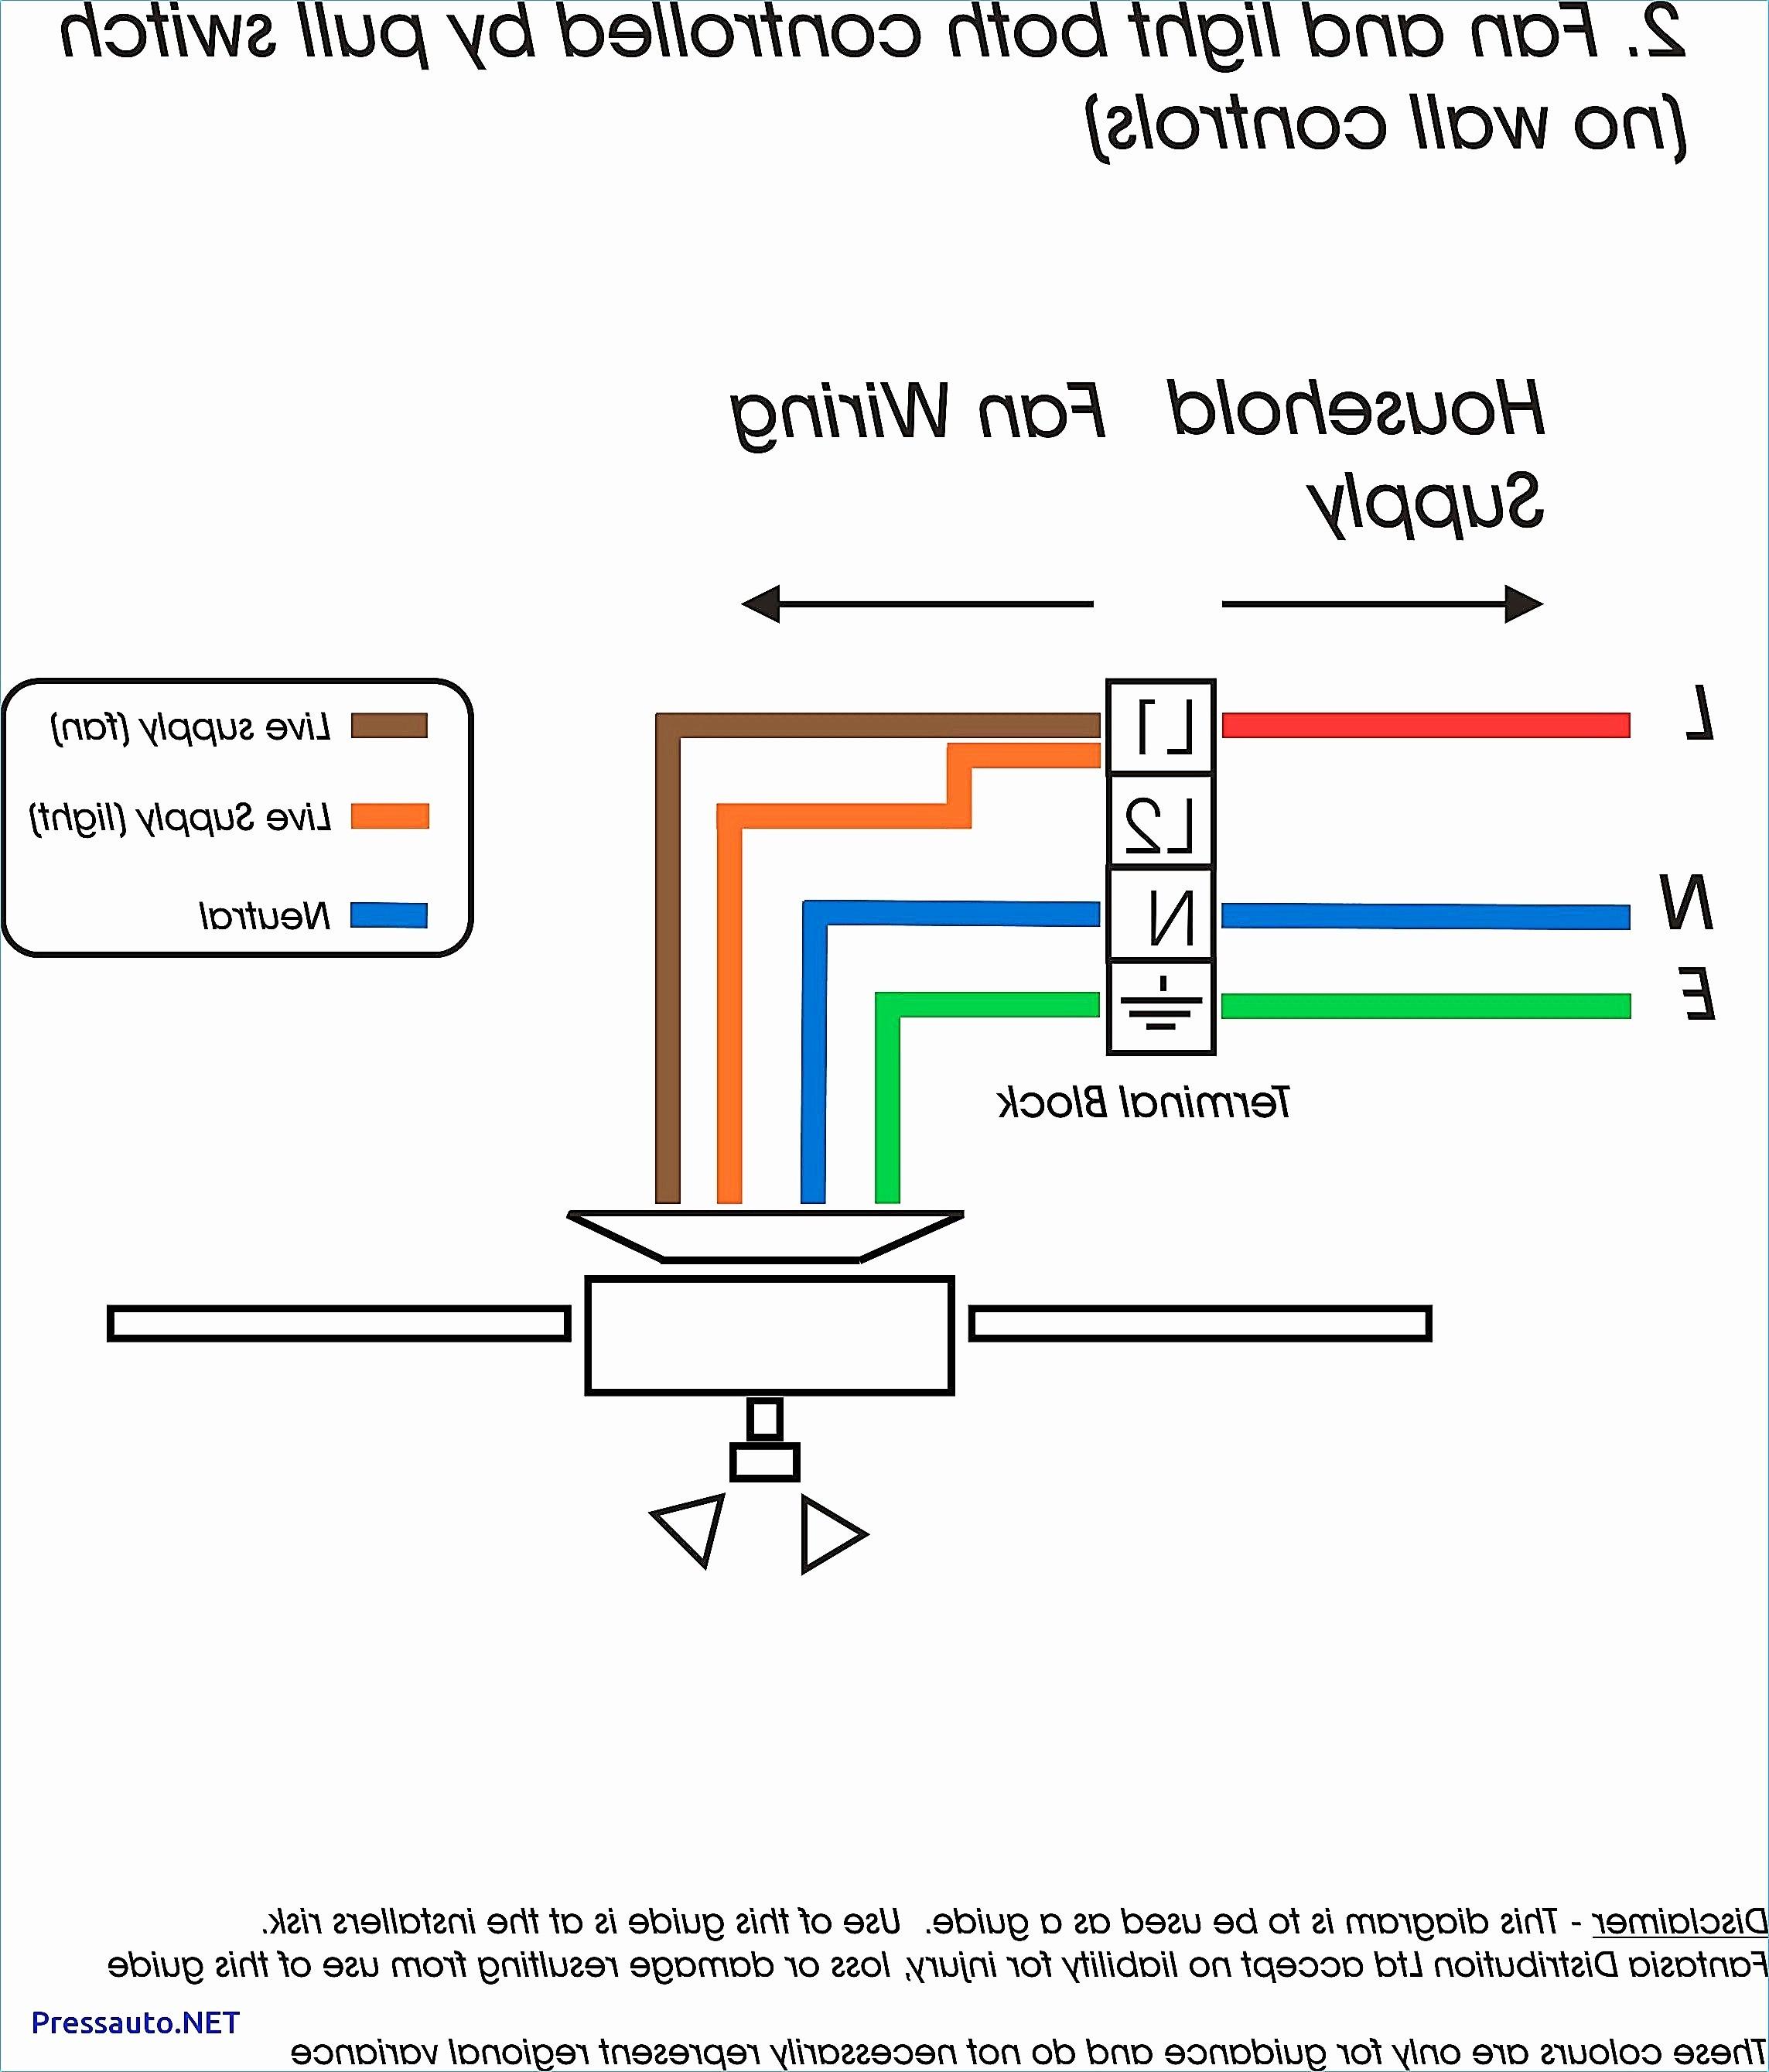 kohler ignition switch wiring diagram wiring diagram image garden tractor ignition  switch diagram kohler engine wiring